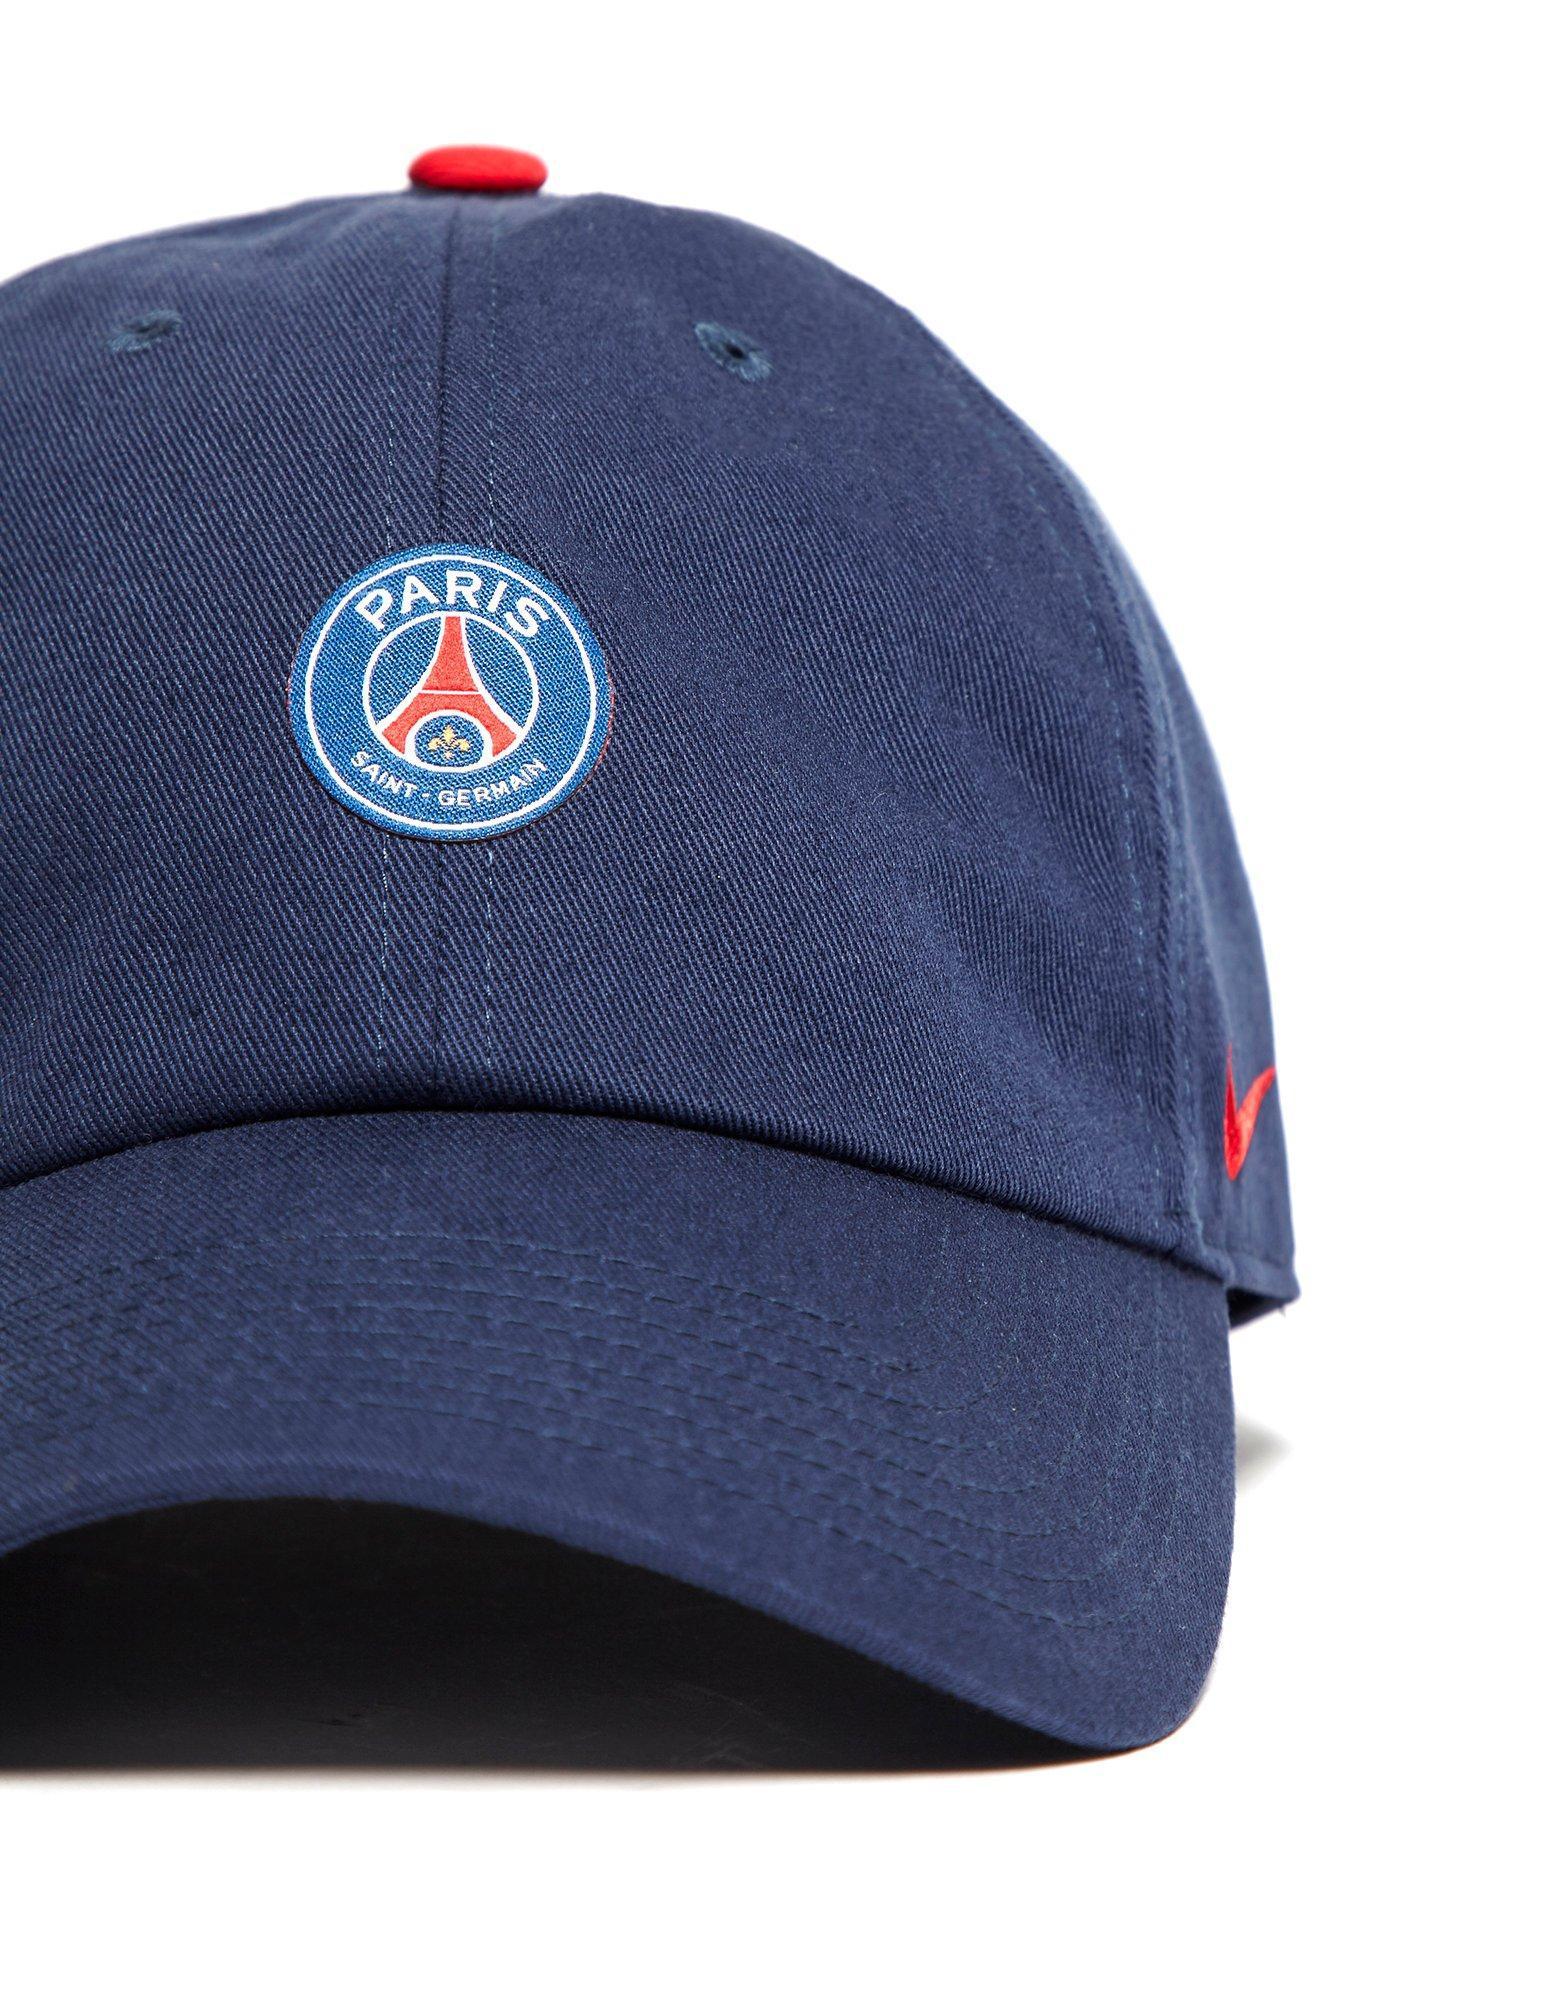 a0fa630b30e Nike Paris Saint Germain H86 Cap in Blue for Men - Lyst